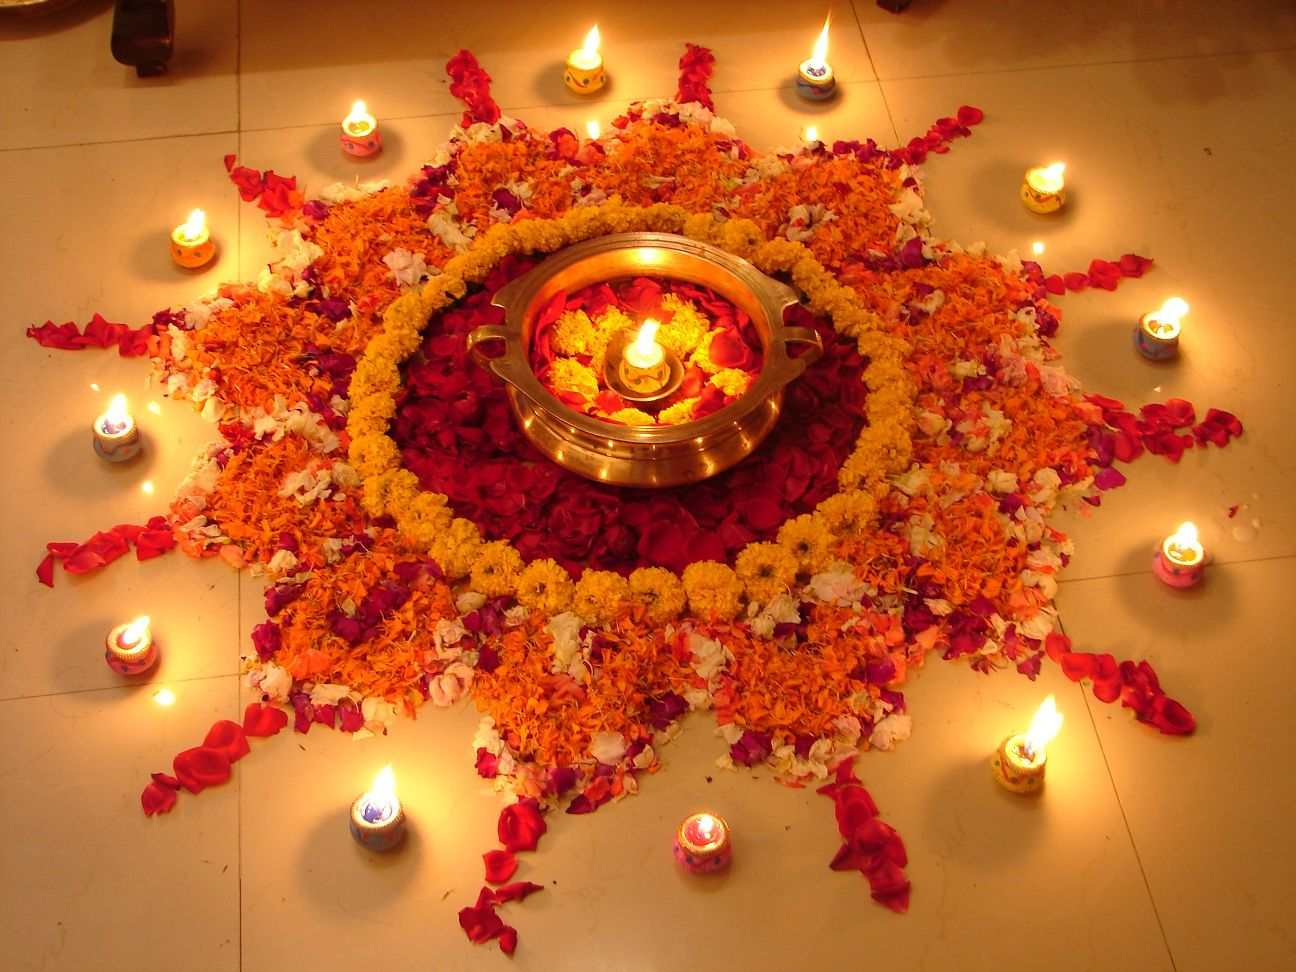 Rangoli Designs with Flowers - Rangoli | Rangoli designs, Diwali ... for Flower Rangoli Designs For Diwali  14lpgtk